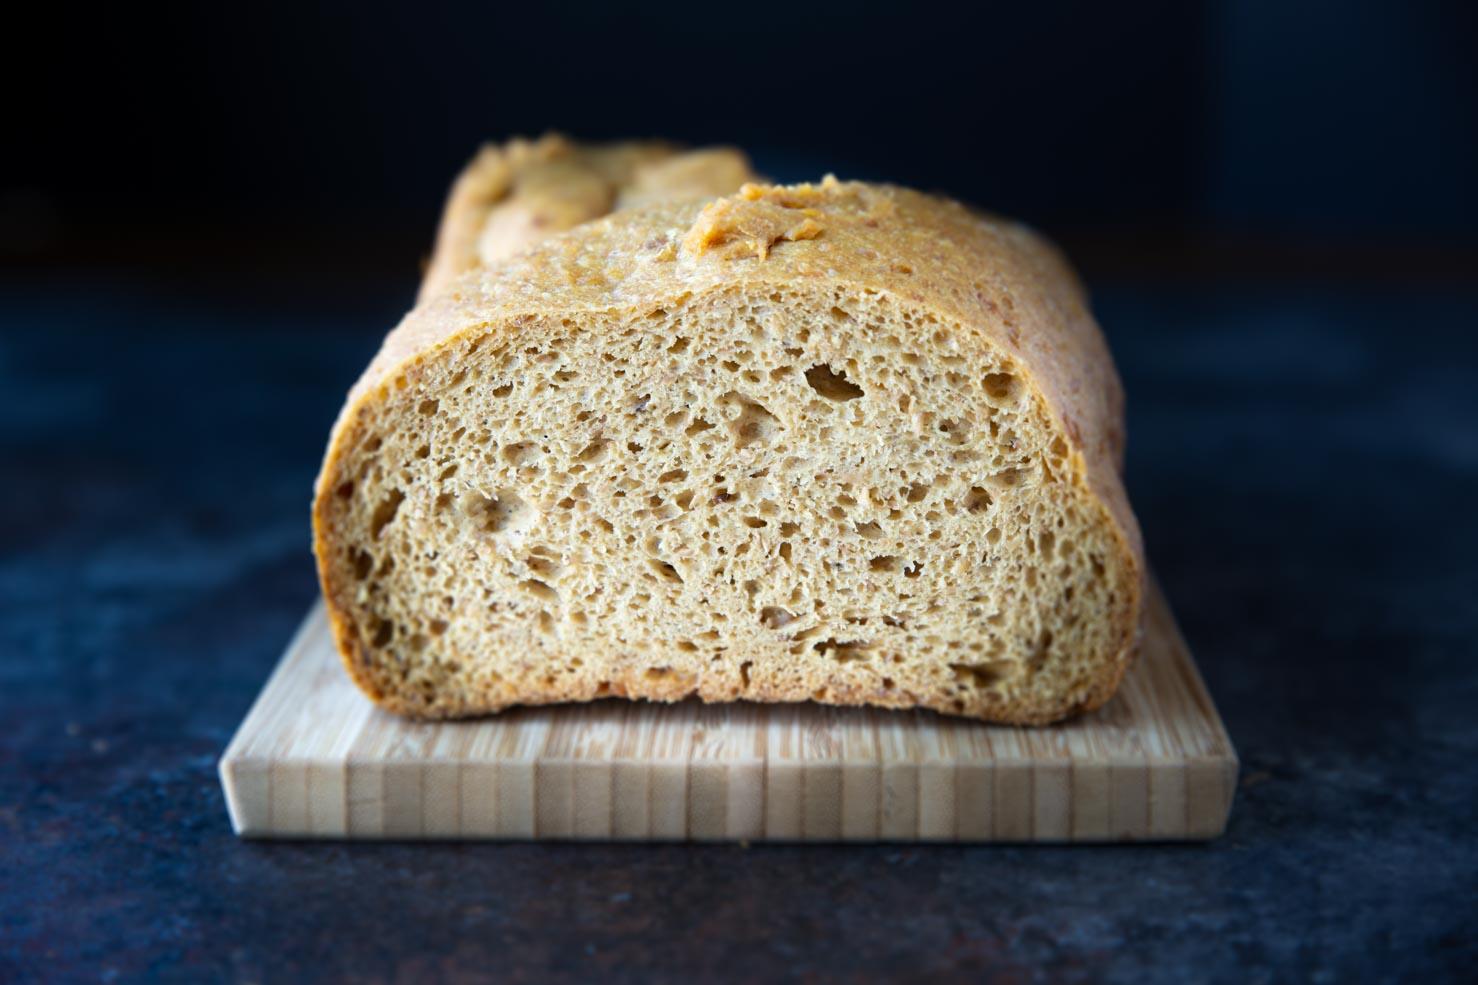 10 best keto bread recipes - a loaf made in a bread machine